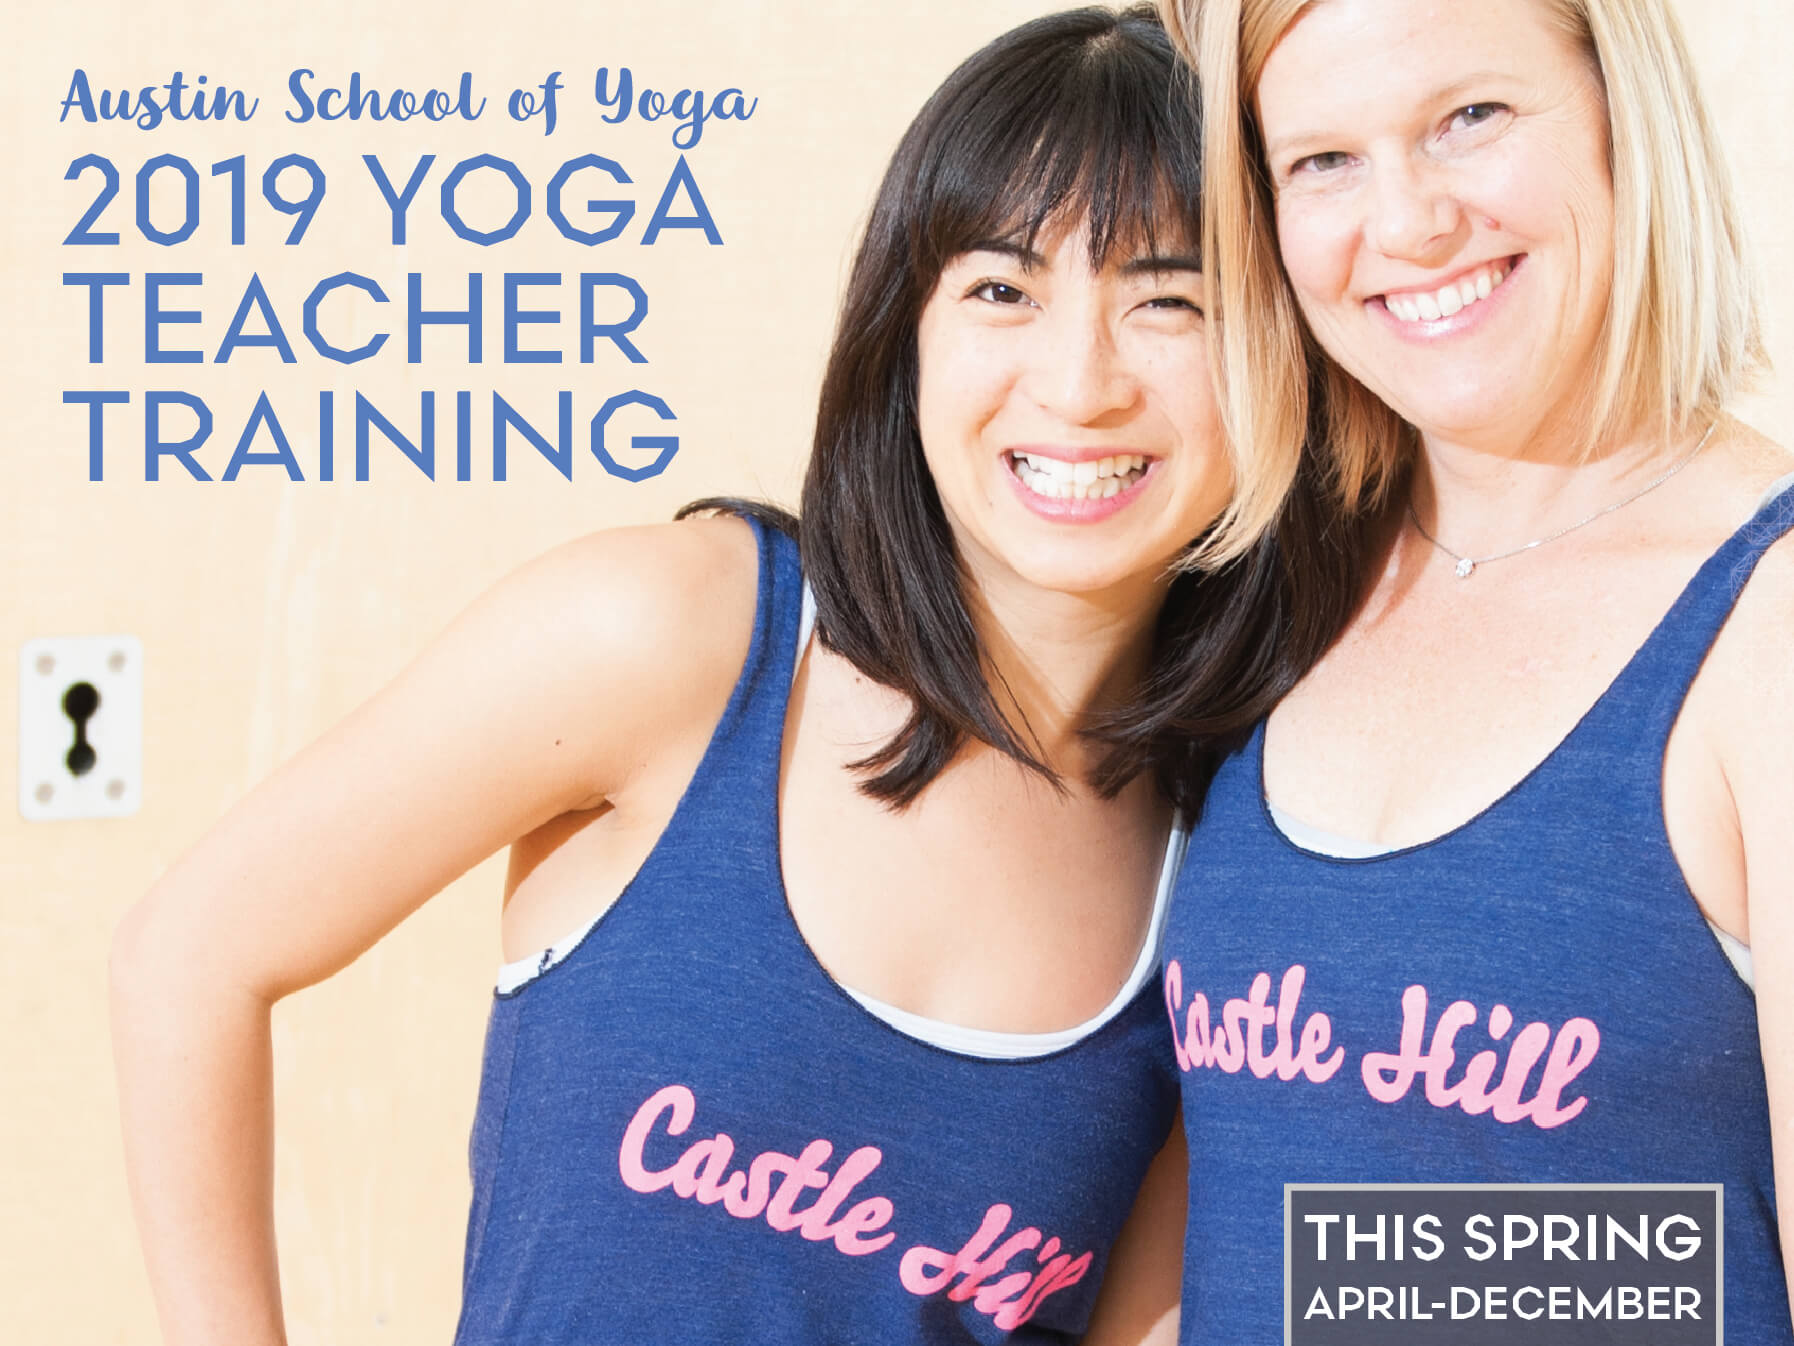 2019 Austin School of Yoga 200-Hour Teacher Training